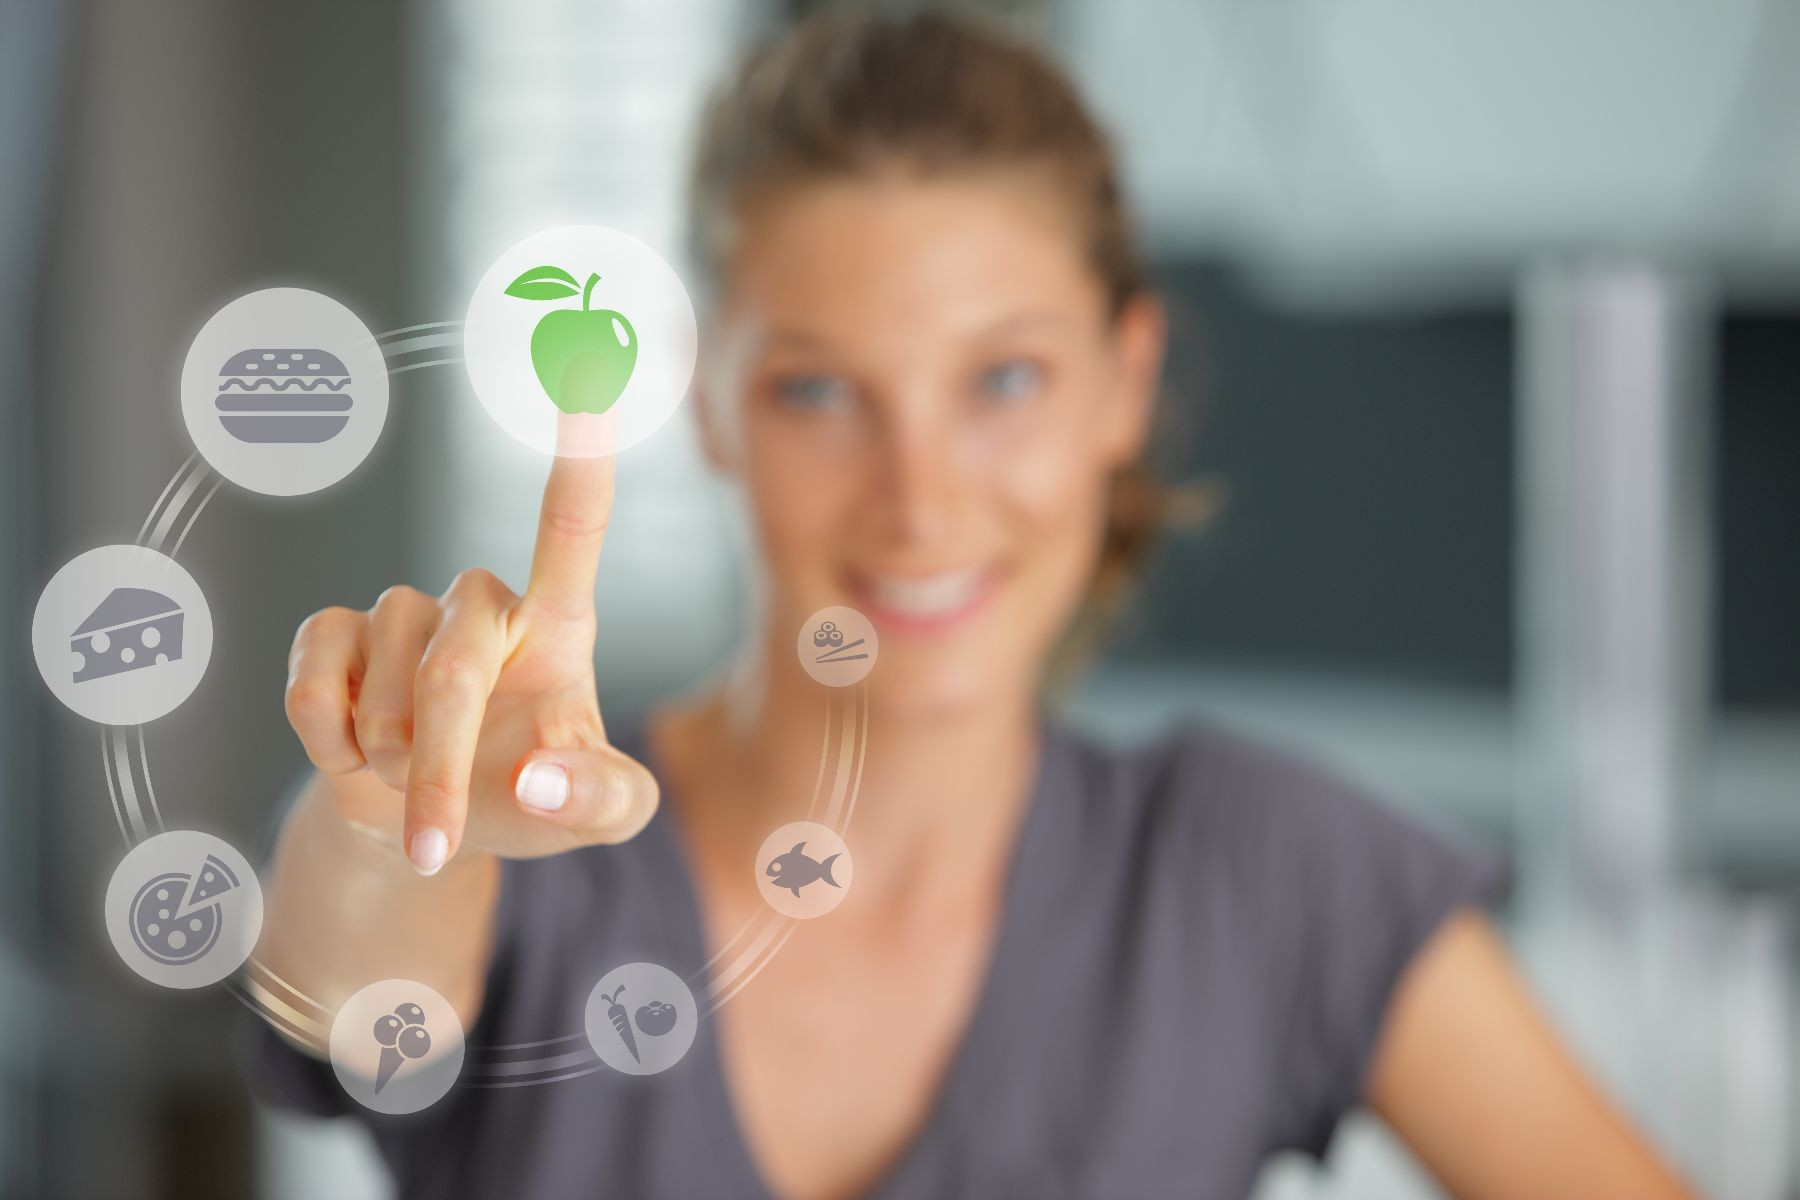 Mujer pulsando icono de manzana